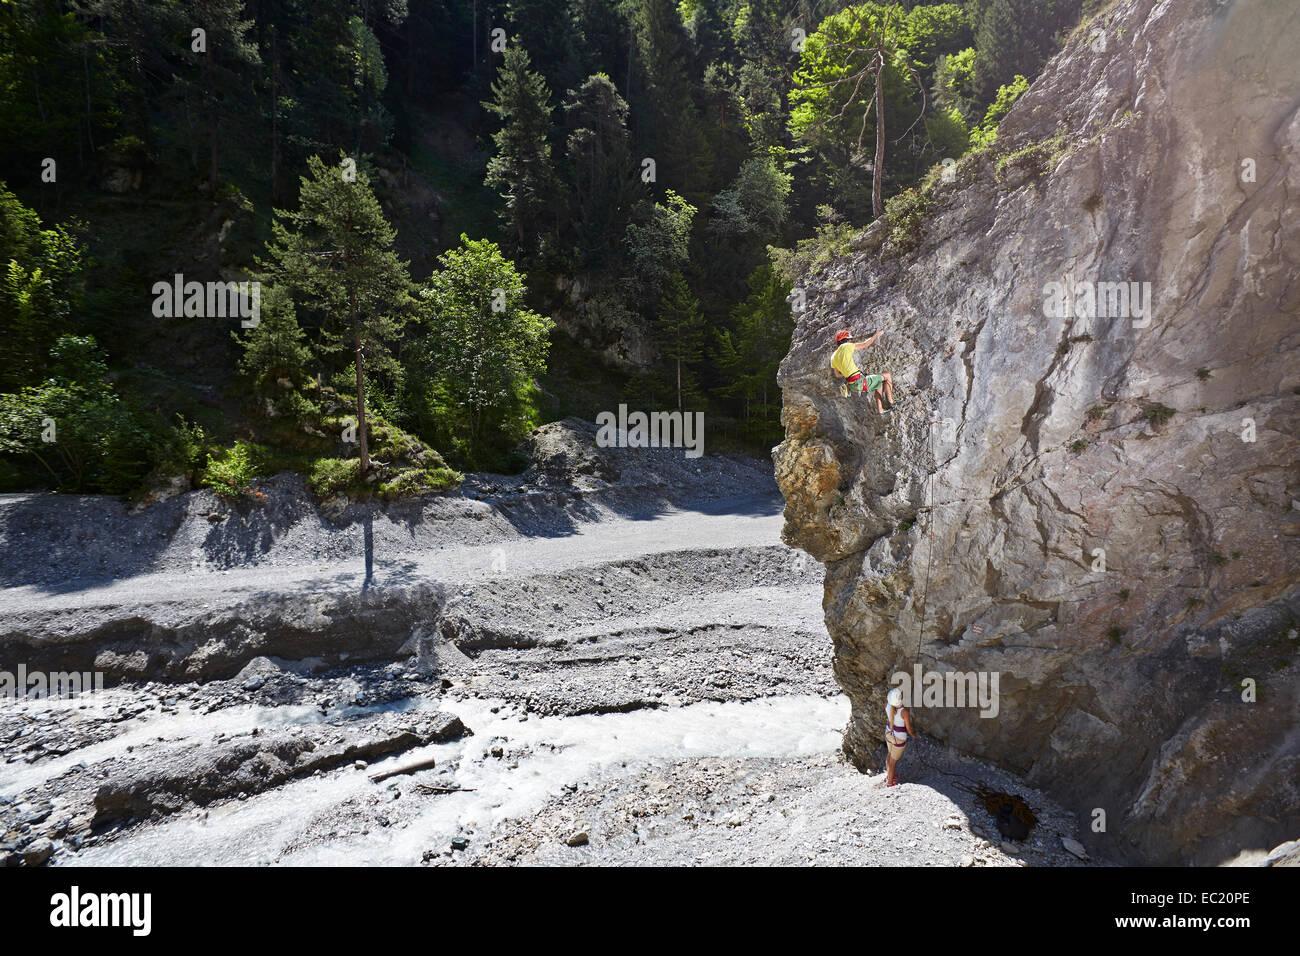 Deporte alpinista escalar una pared de roca, Ehnbachklamm Gorge, Zirl, Tirol, Austria Imagen De Stock